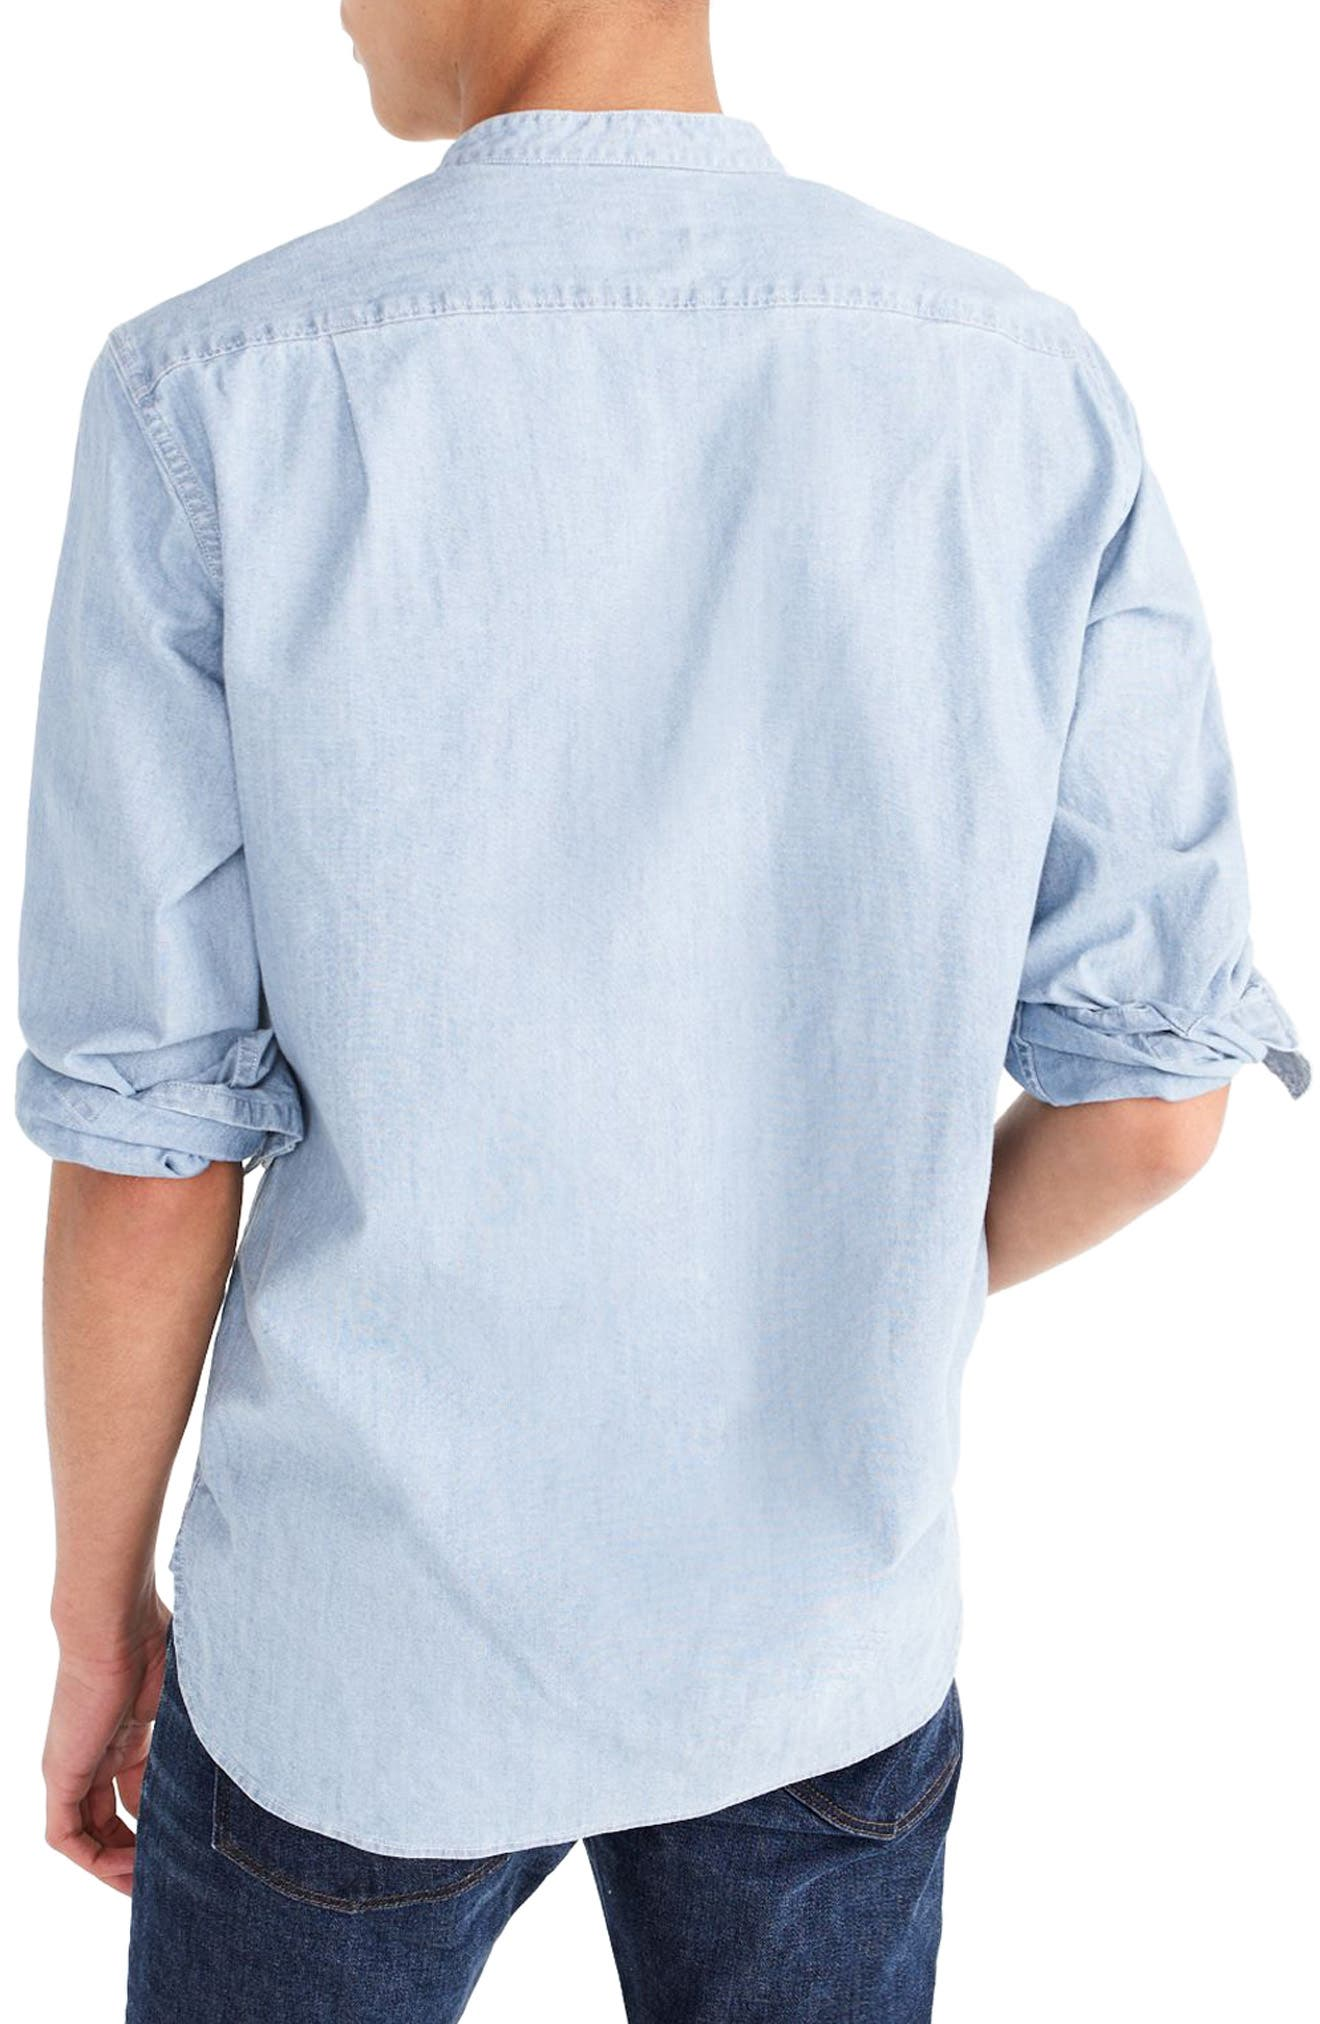 Stretch Chambray Band Collar Shirt,                             Alternate thumbnail 2, color,                             400